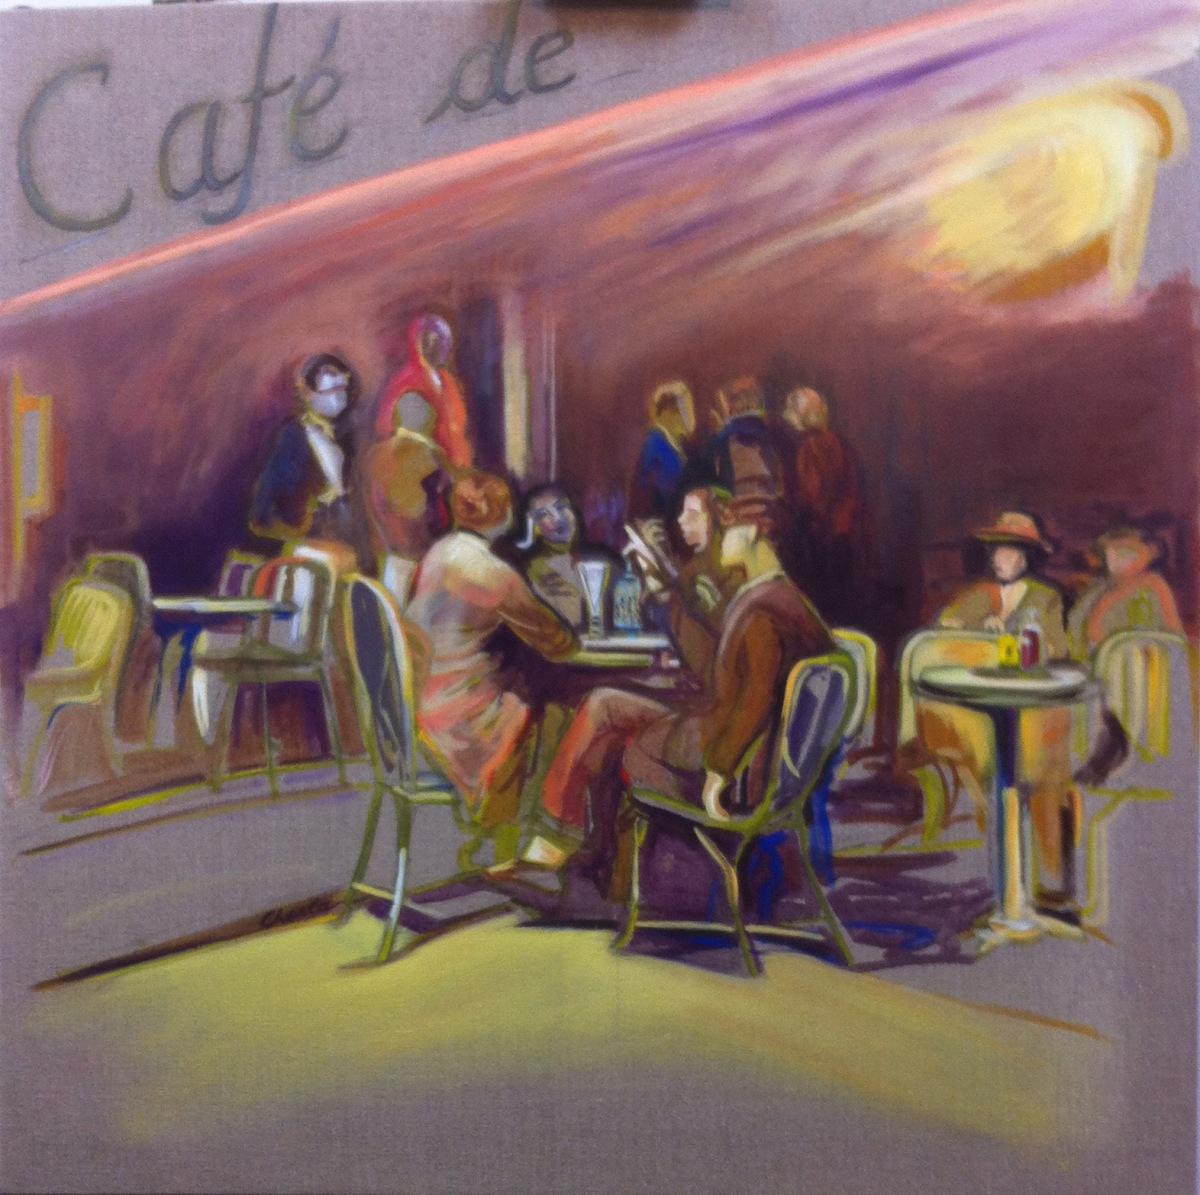 Café de... carré